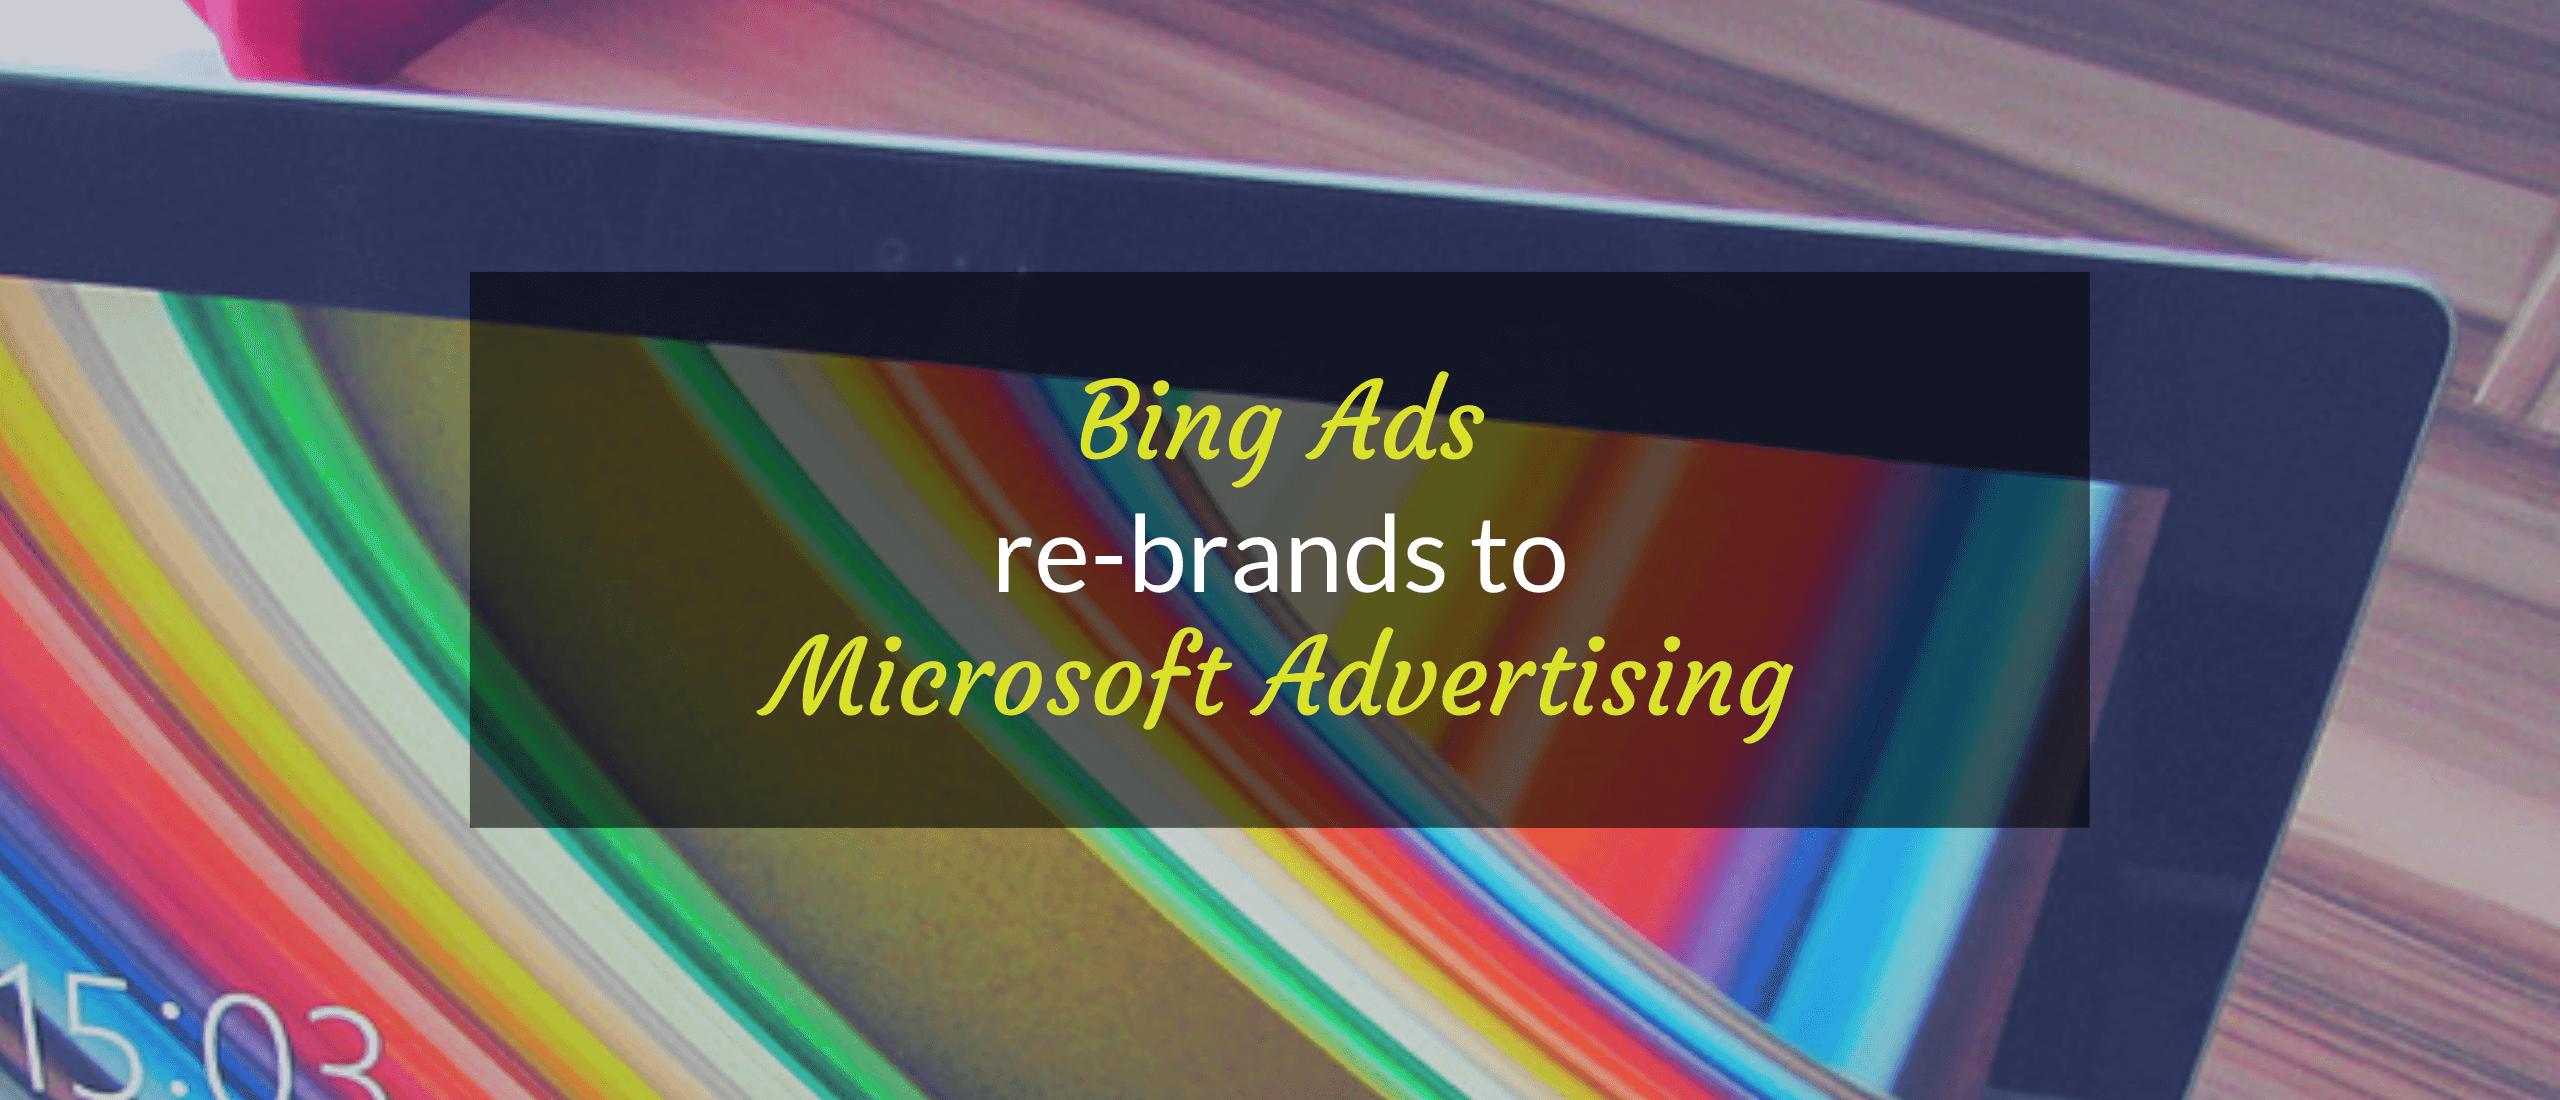 Header image of Bing Ads rebrands to Microsoft Advertising article.